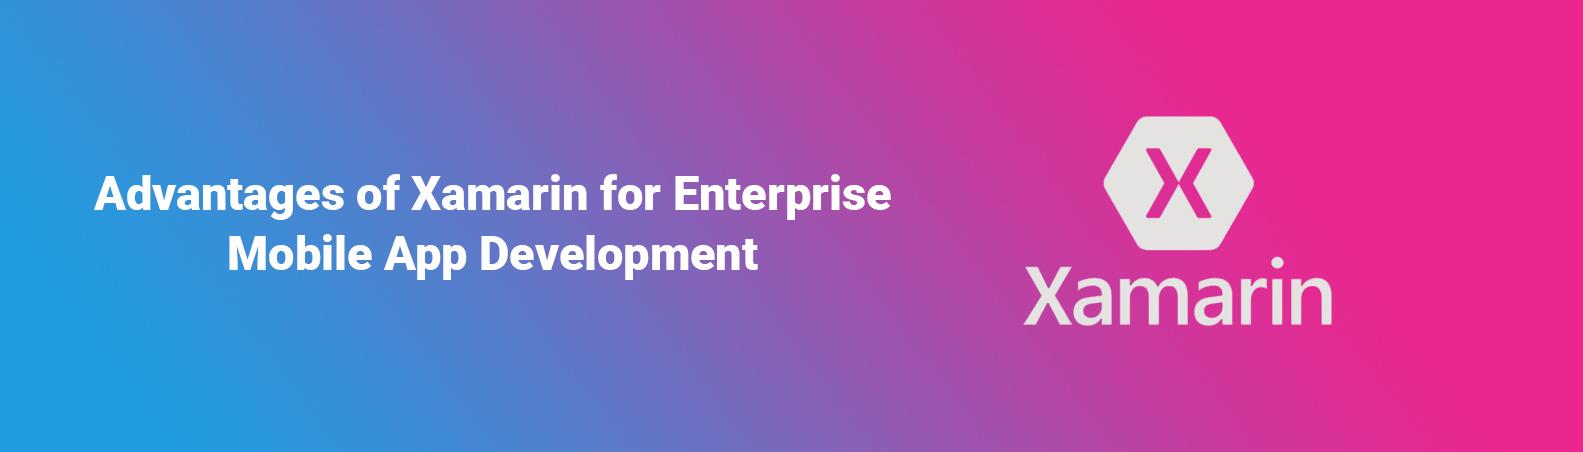 Advantages of Xamarin for Enterprise Mobile App Development